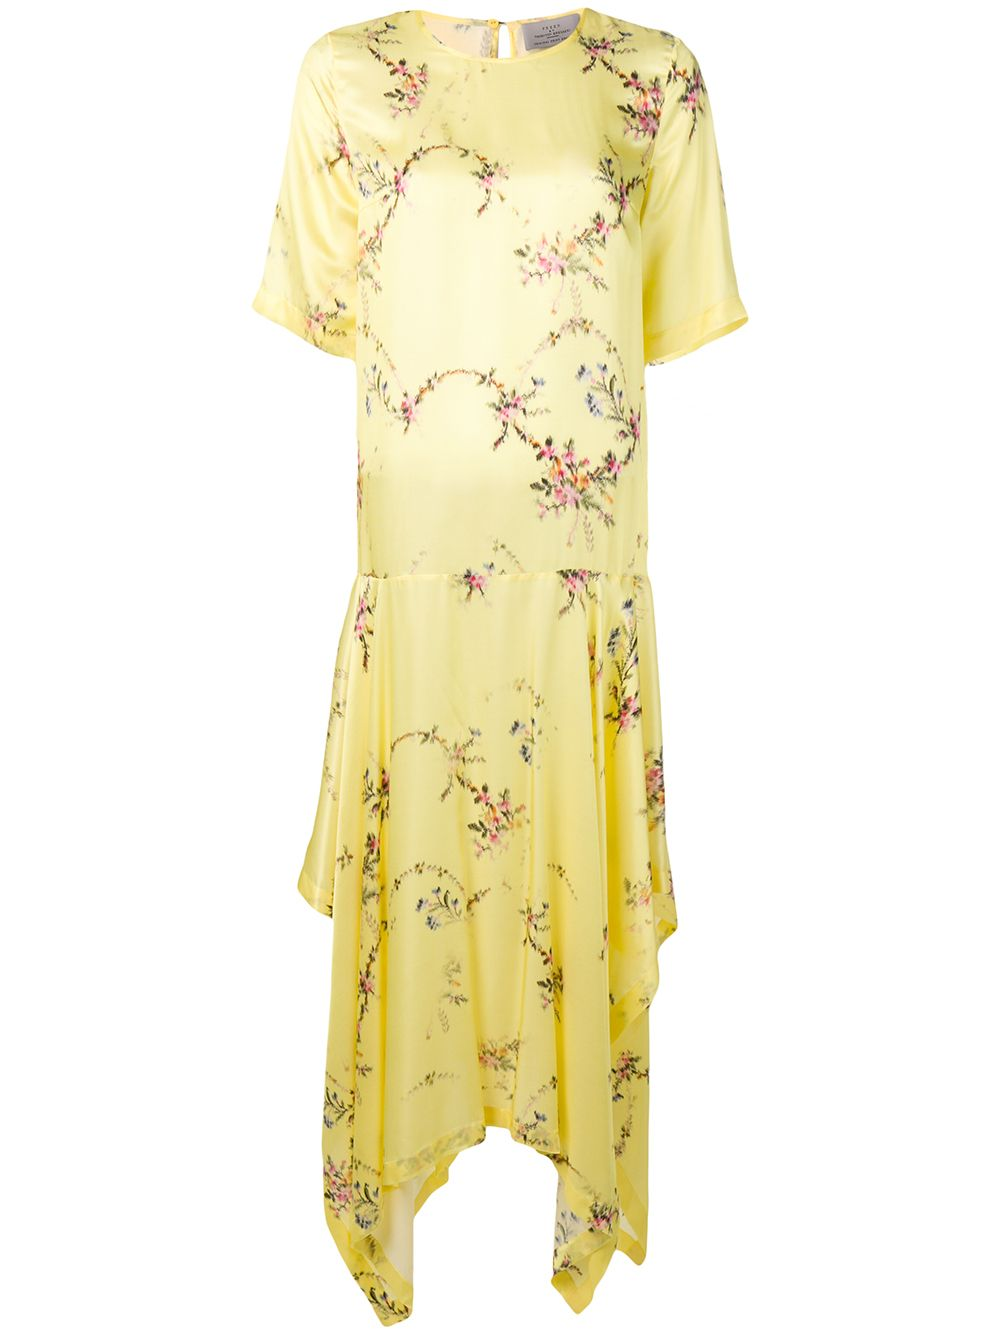 Preen By Thornton Bregazzi | асимметричное платье макси | Clouty